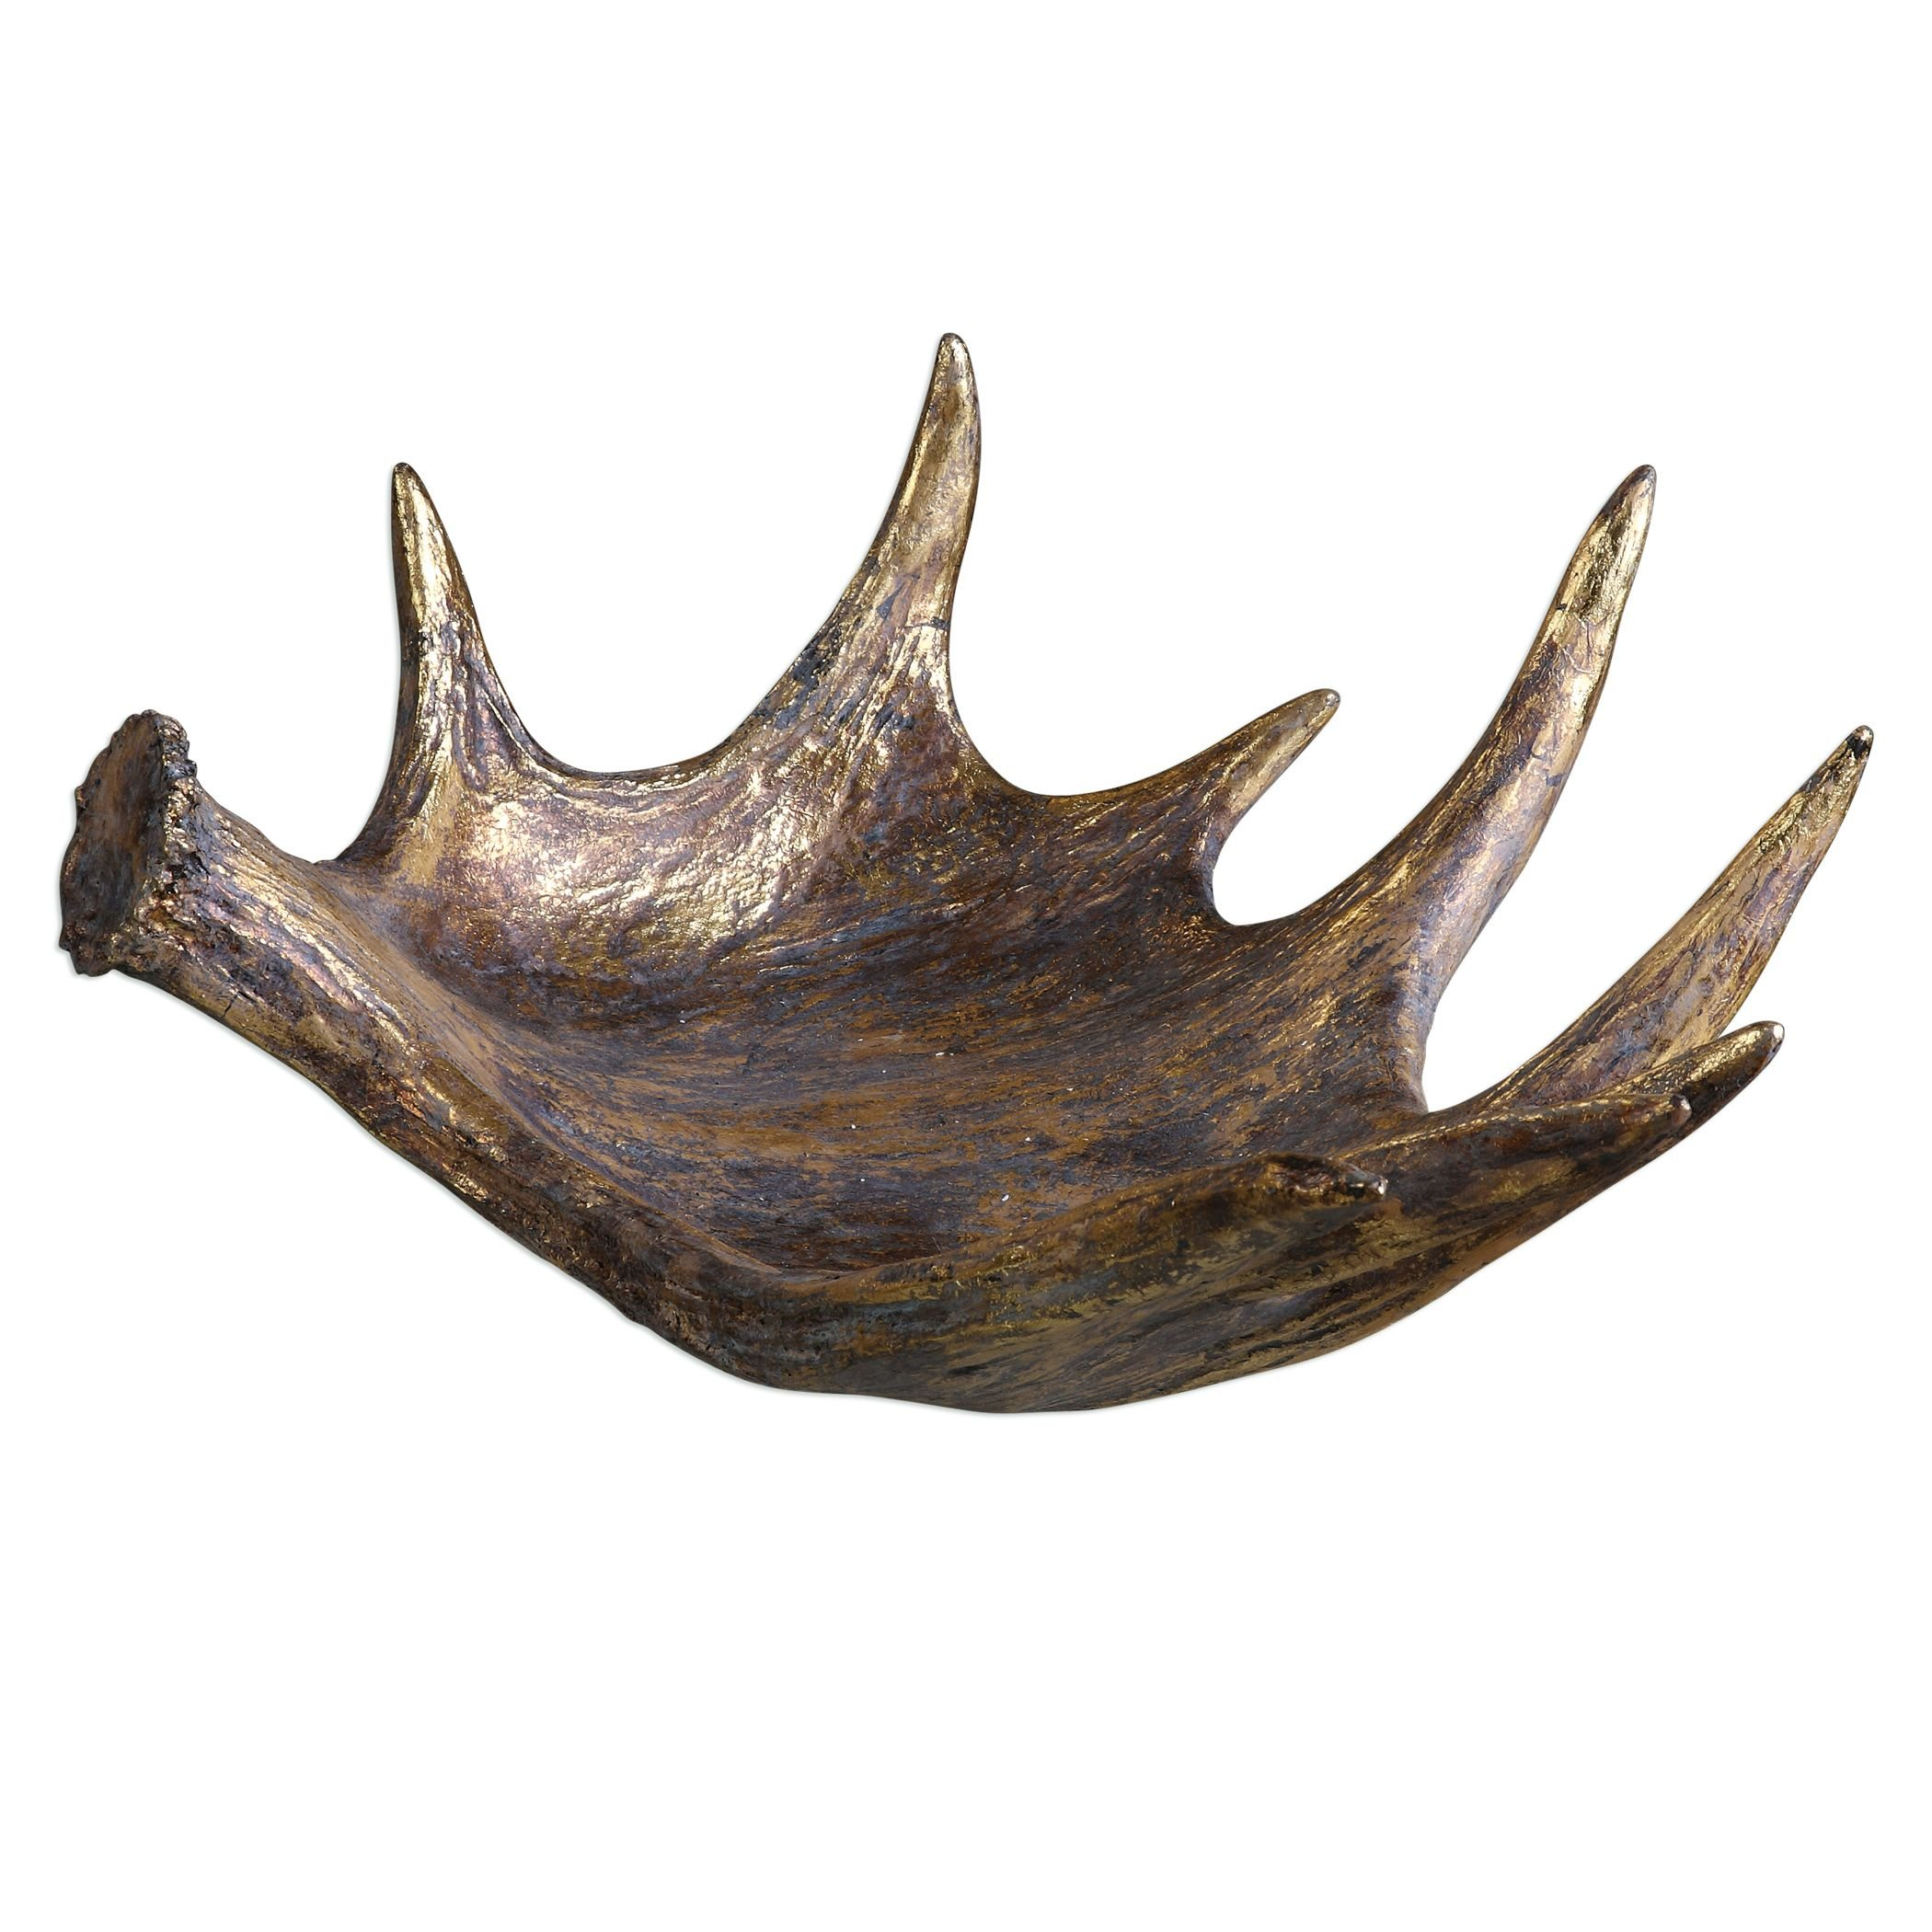 Elegant Rustic Faux Antler Centerpiece Bowl | Decorative Lodge Moose Sculpted